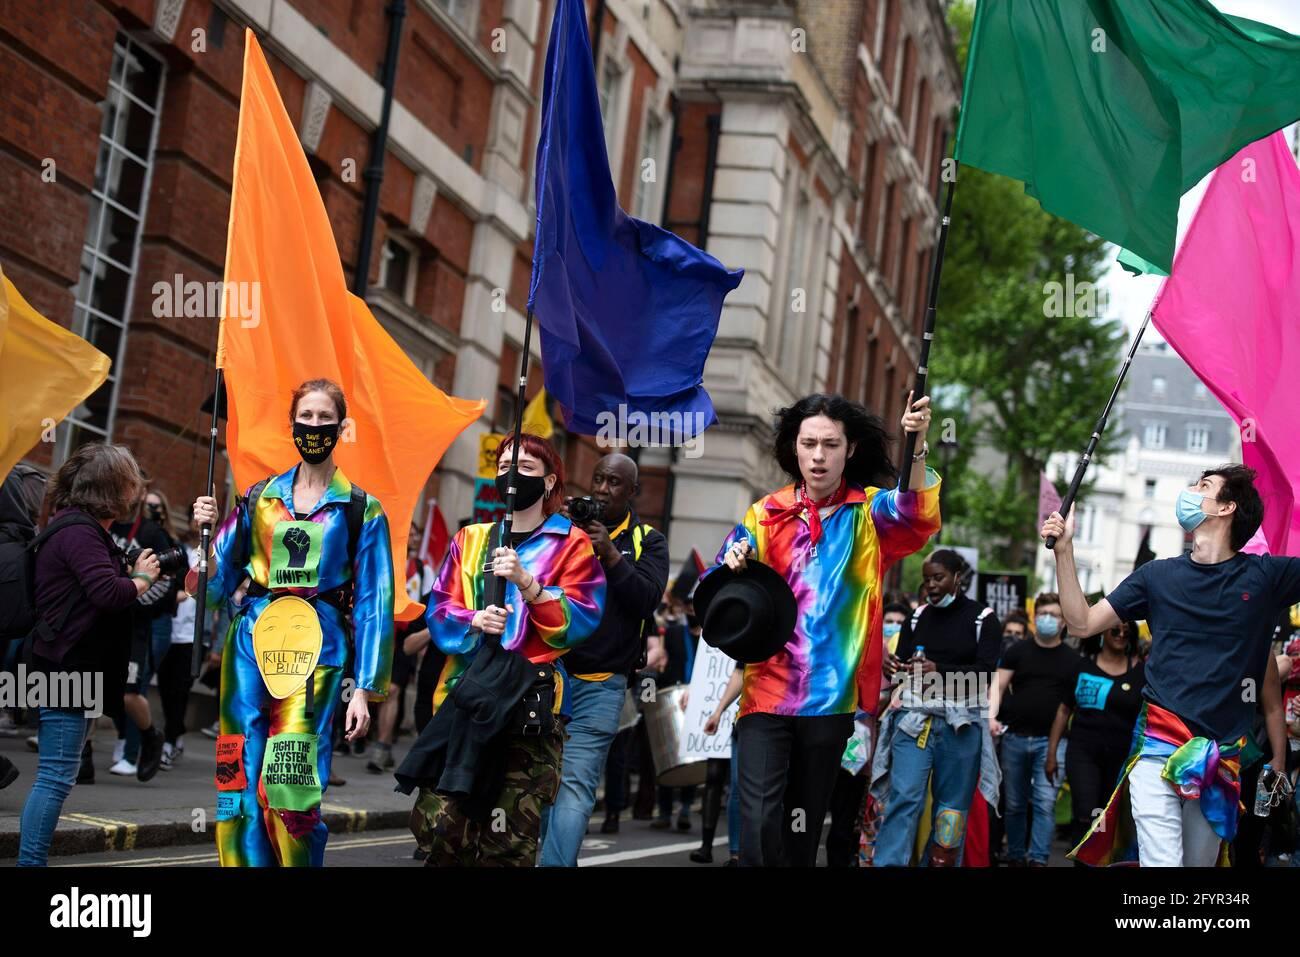 London, UK - 29th May 2021: Kill the Bill IV Protest Credit: Loredana Sangiuliano / Alamy Live News Stock Photo